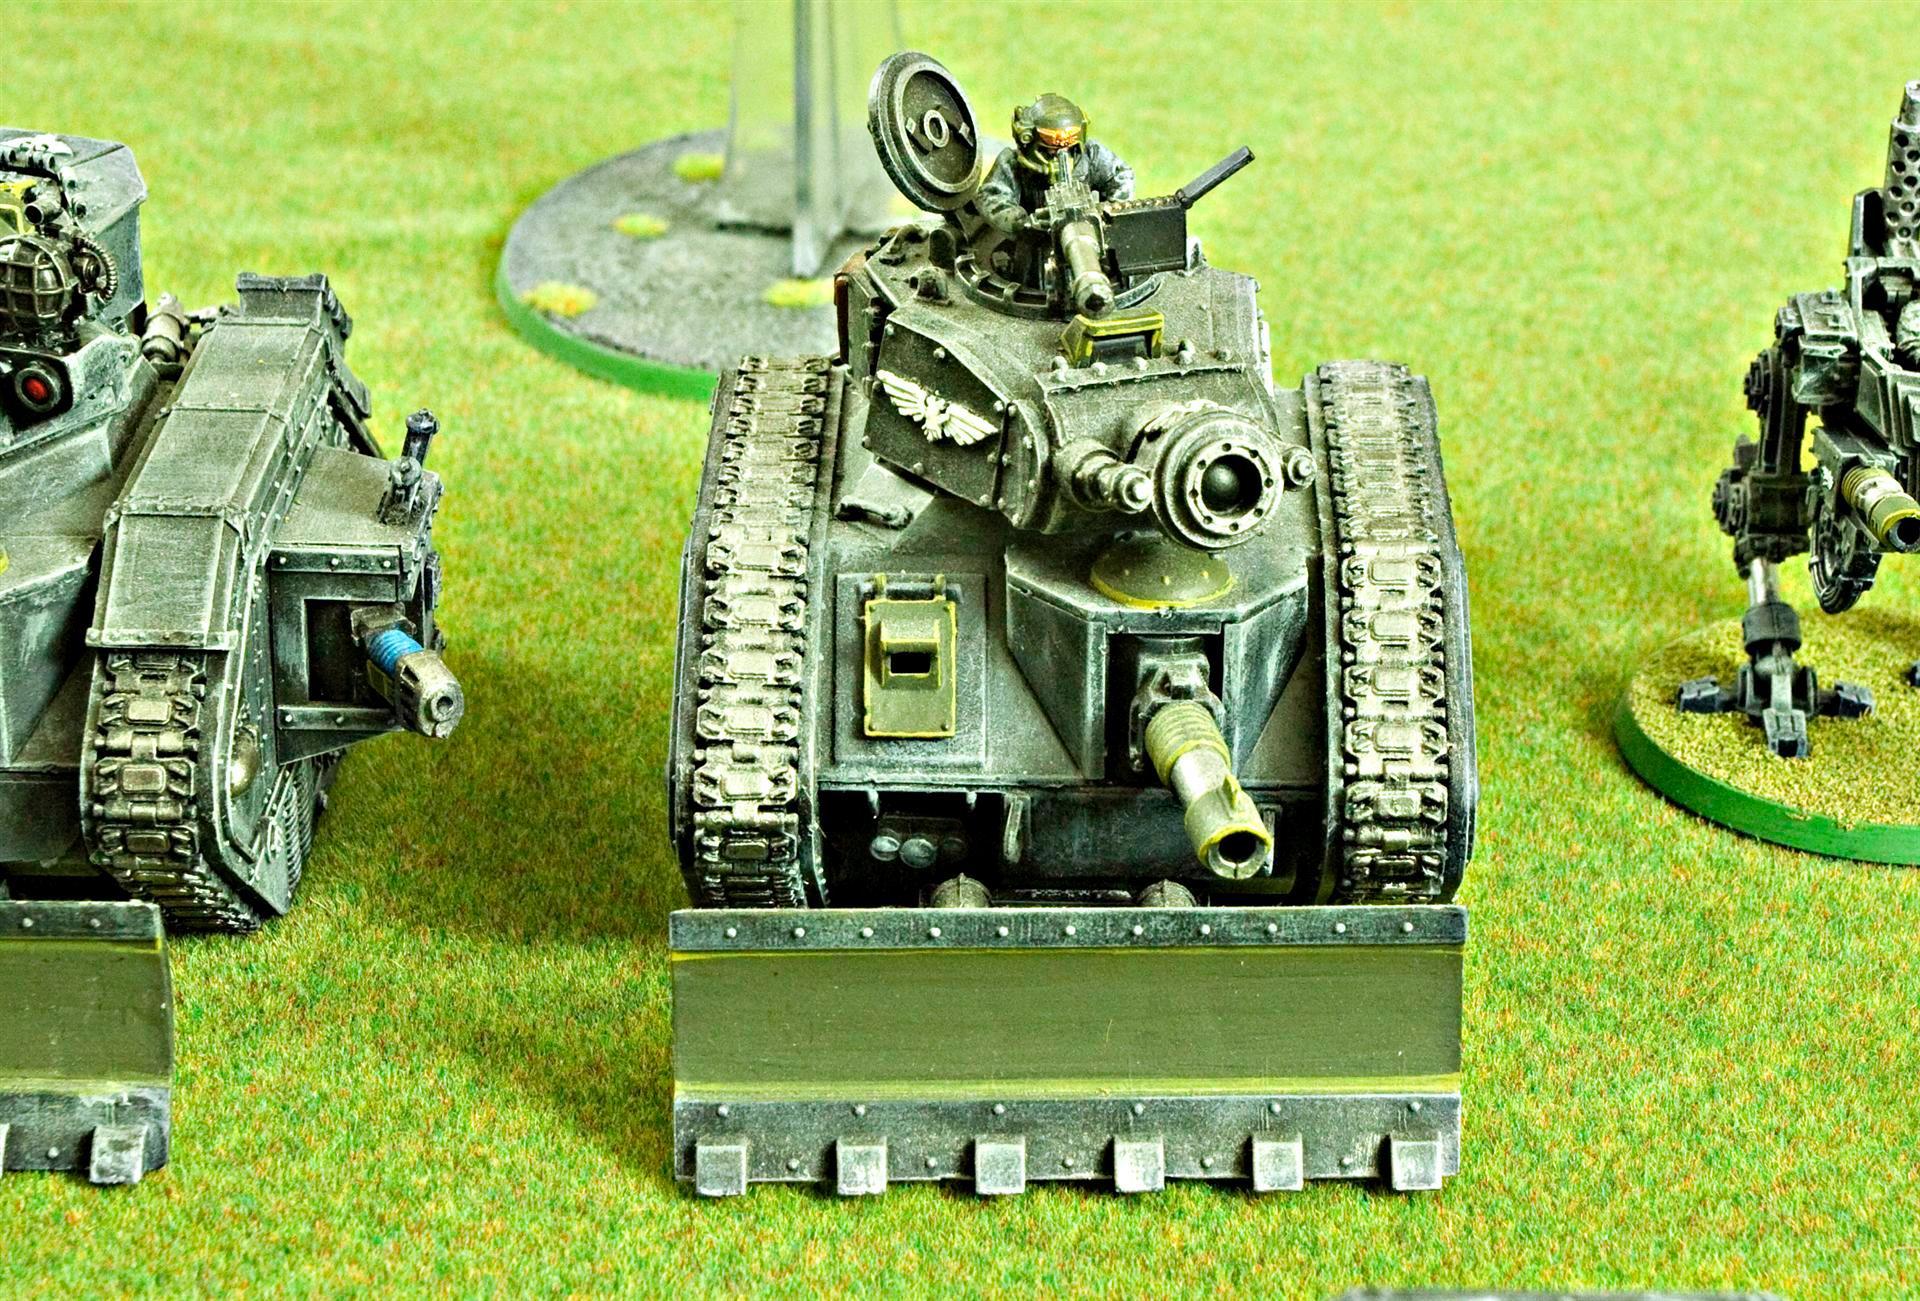 Astra Militarum, Demolisher, Guard, Heavy Stubber, Imperial, Imperial Guard, Leman Russ, Plasma Cannon, Warhammer 40,000